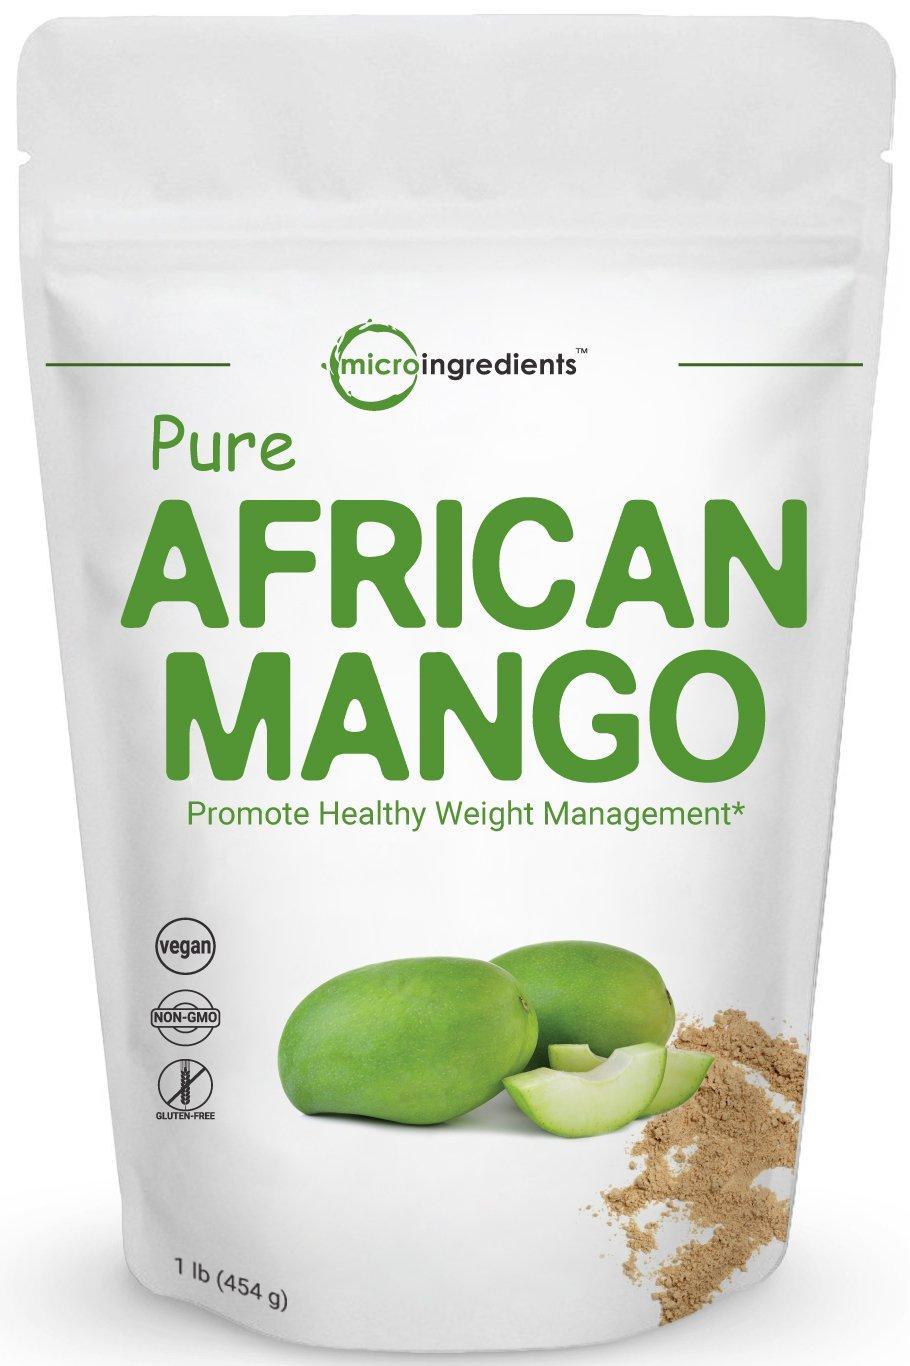 Maximum Strength Pure African Mango Extract Powder (Irvingia Gabonensis, Wild Mango), 1 Pound, Supports Metabolism and Fat Burning, Non-GMO and Vegan Friendly.